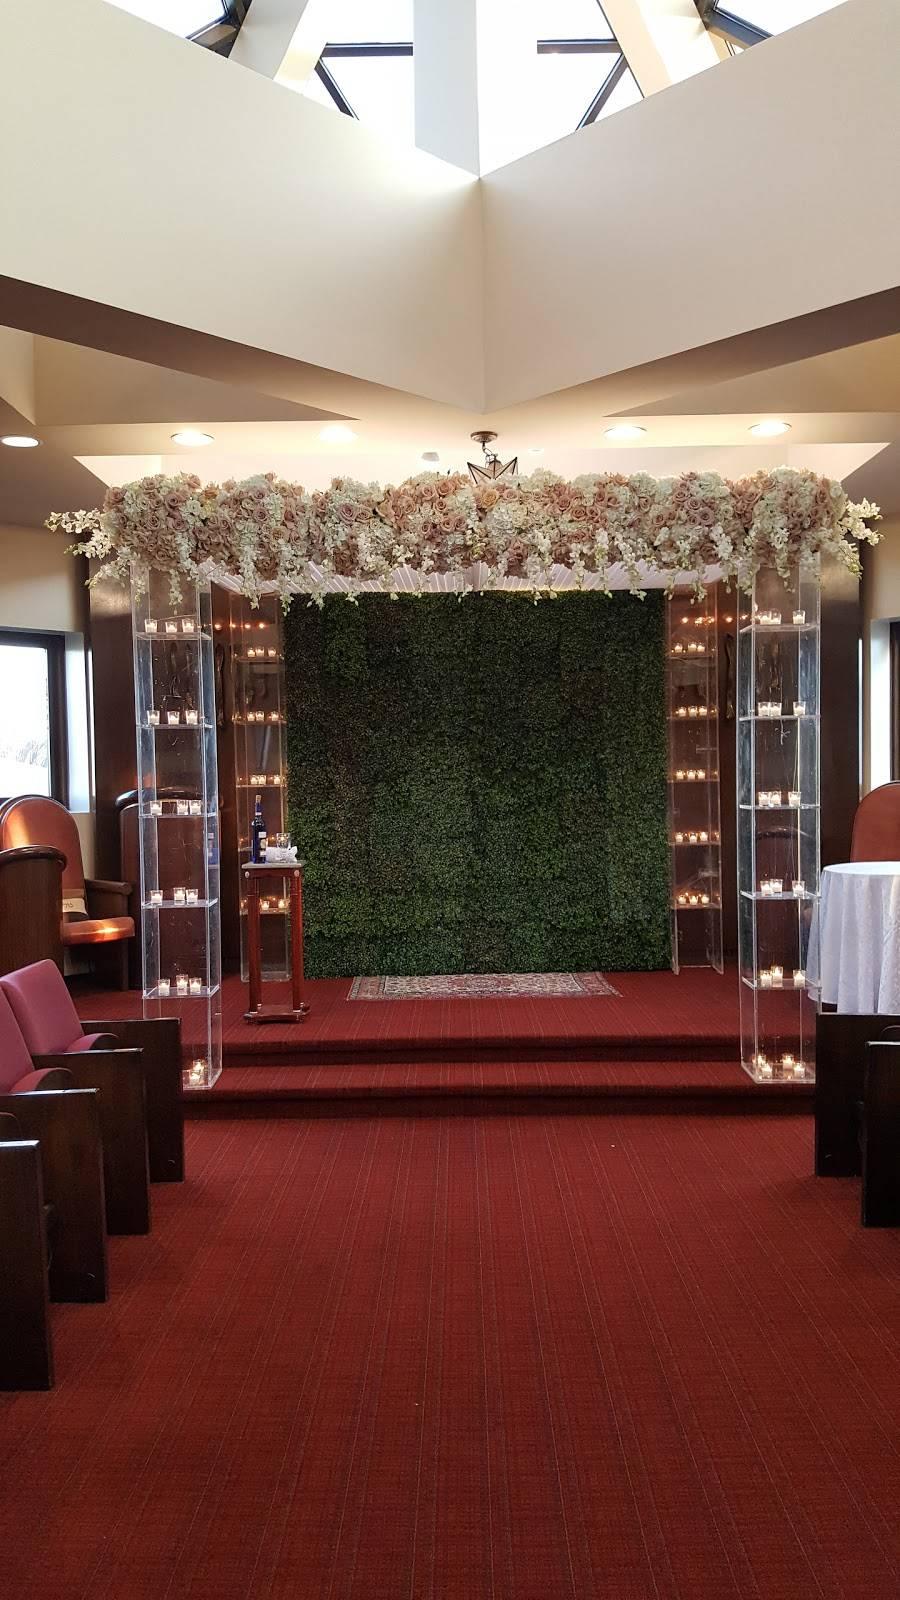 Ohel David & Shlomo - synagogue  | Photo 5 of 9 | Address: 710 Shore Blvd, Brooklyn, NY 11235, USA | Phone: (718) 648-0100